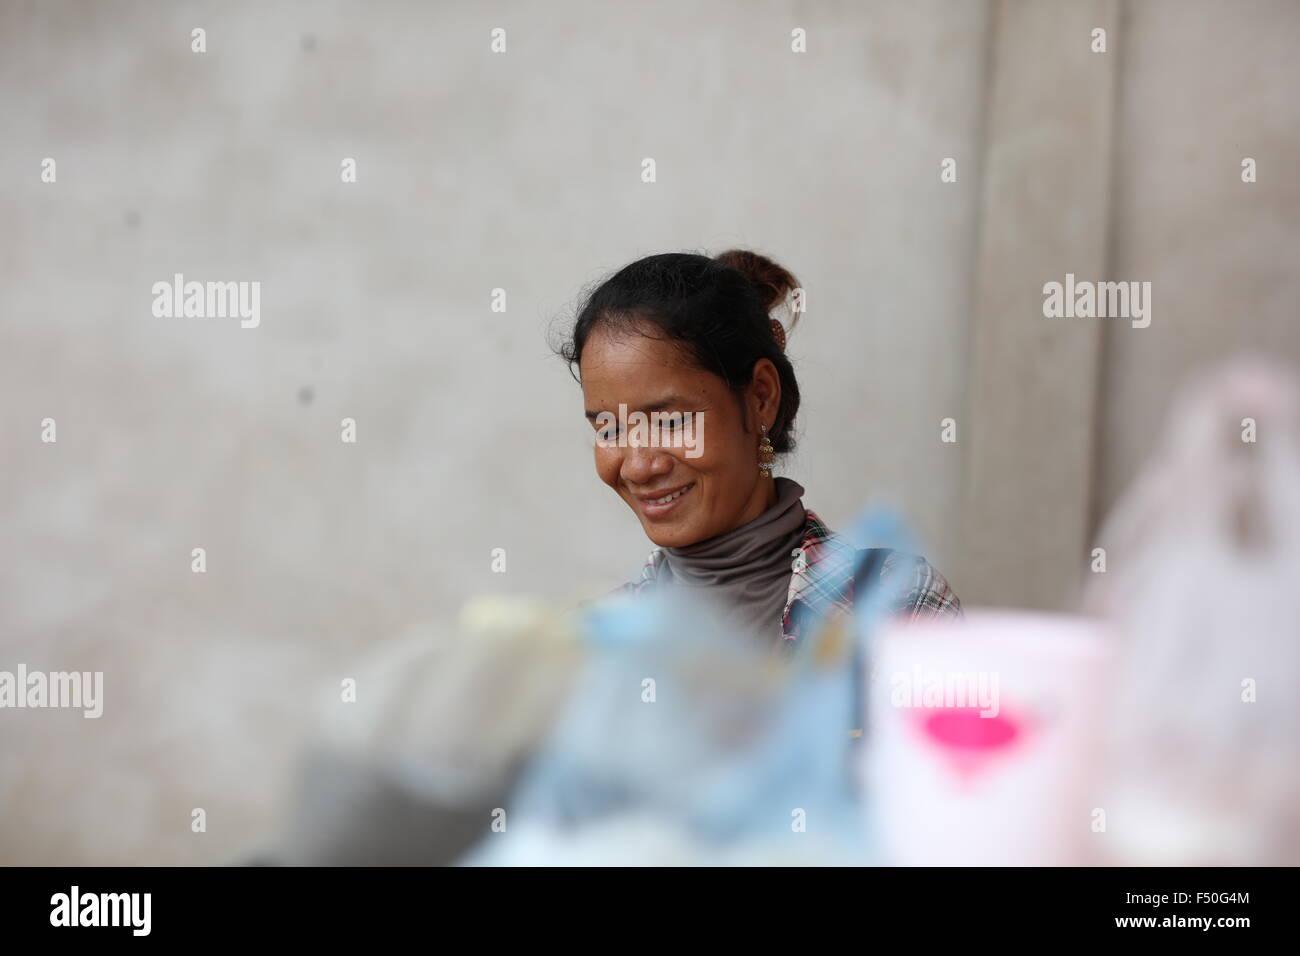 portrait-of-asian-woman-smiling-F50G4M.j